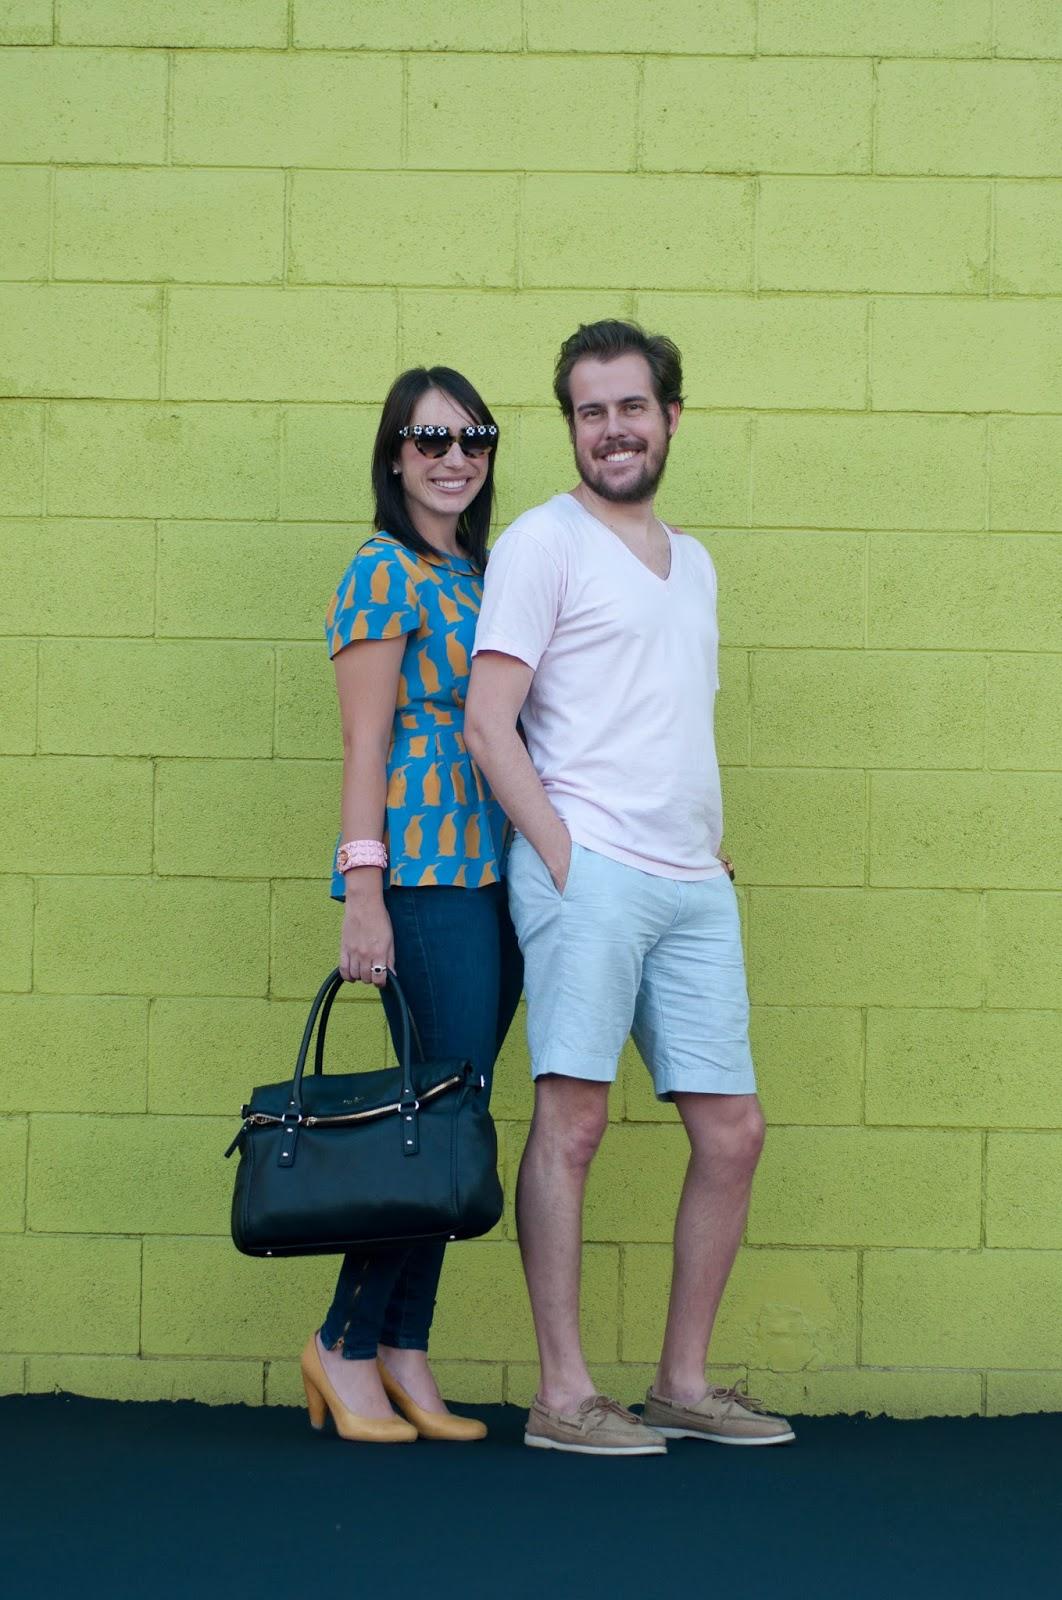 couples fashion, couples style, ootd, what i wore, utah fashion blog, prada flower sunglasses, vneck shirt